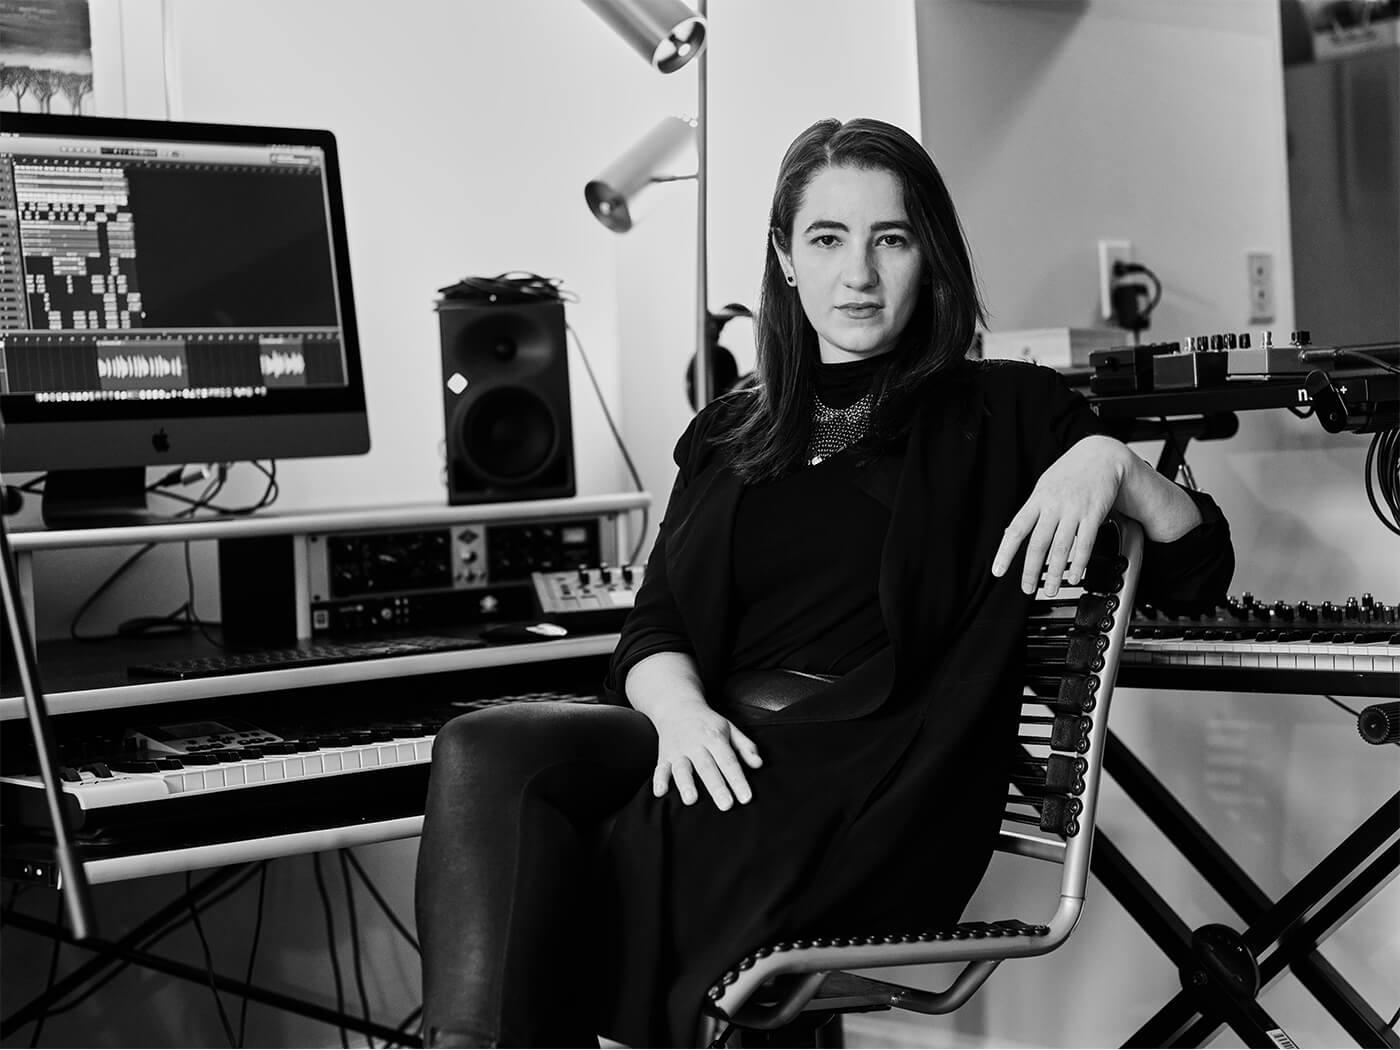 Danielle Schwob Show Off Your Studio